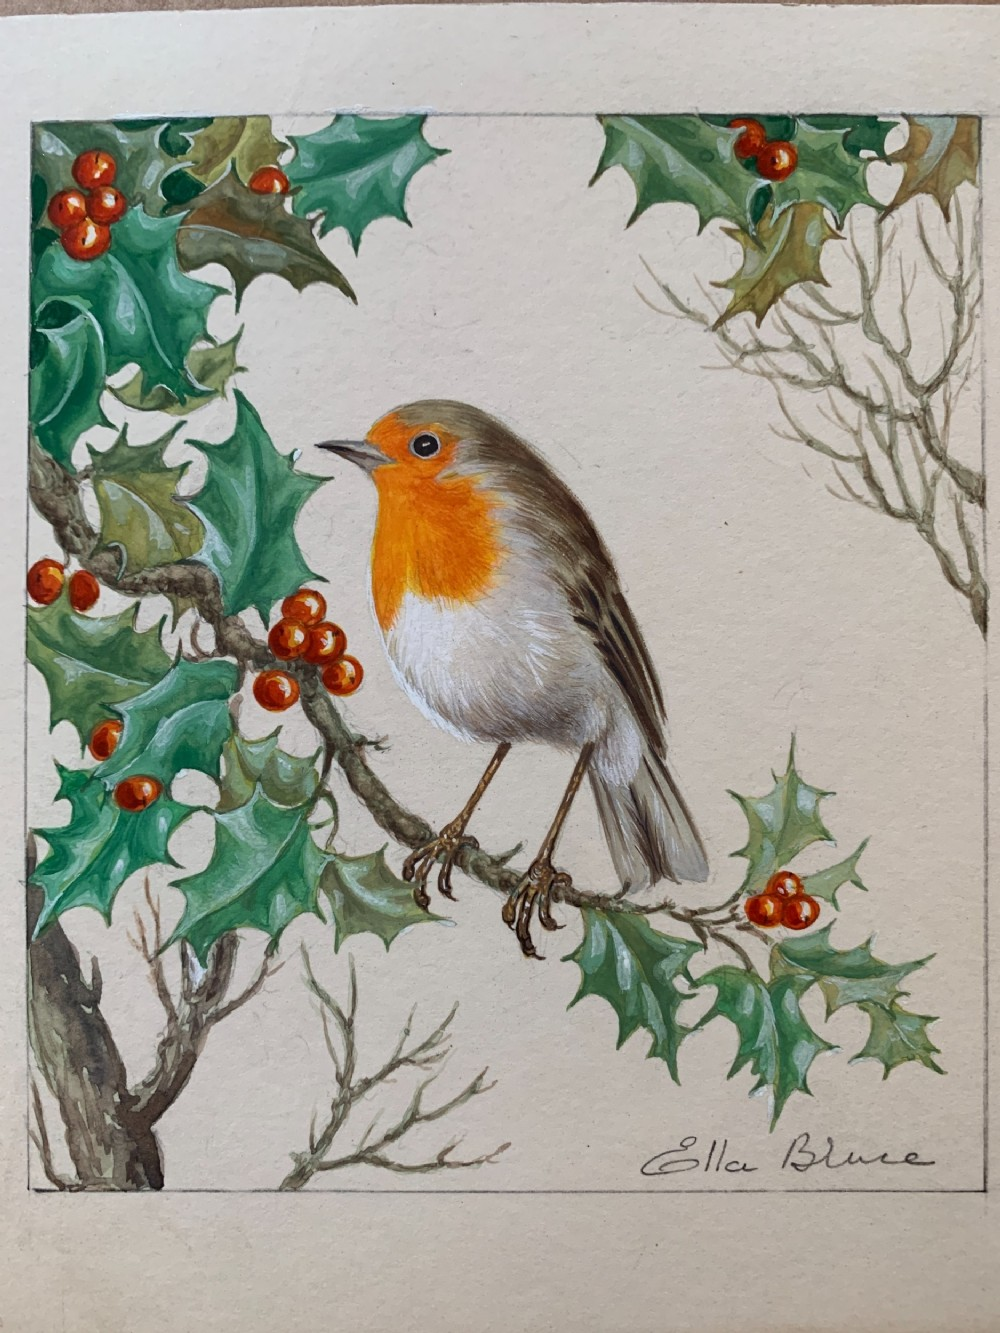 ella bruce english watercolor of a robin on a holly bush